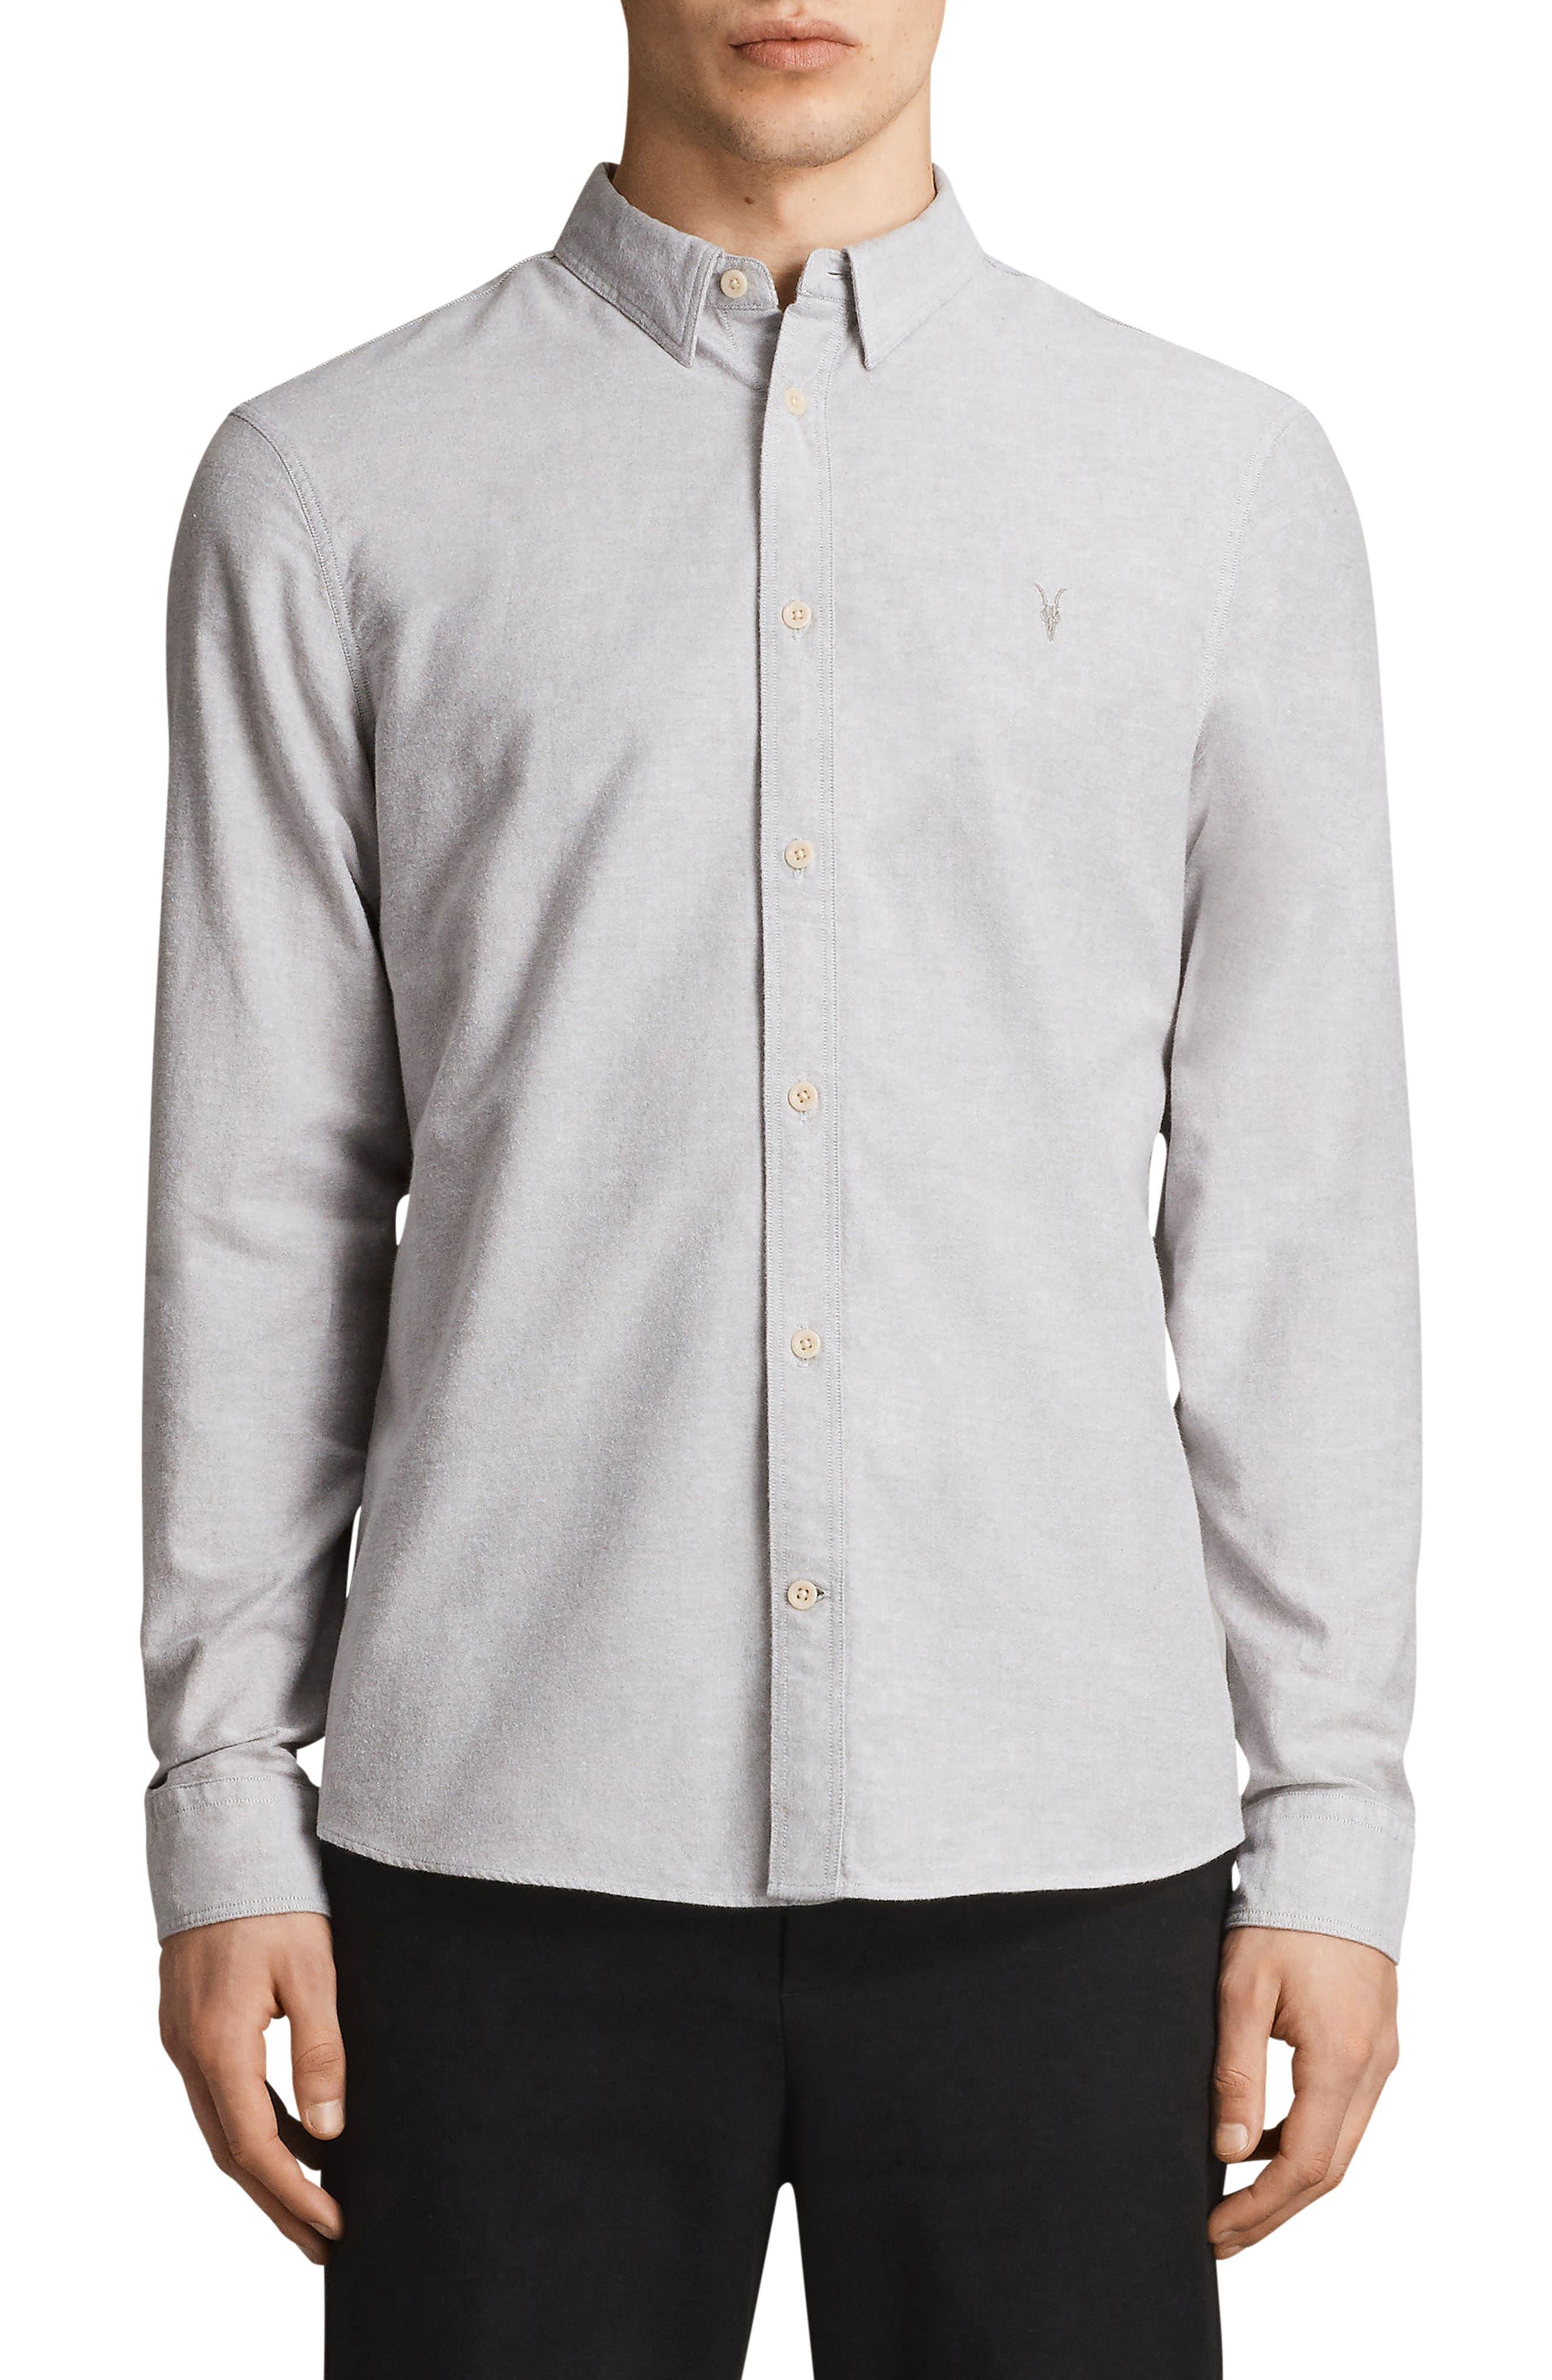 Huntington Regular Fit Sport Shirt,                             Main thumbnail 1, color,                             DARK GULL GREY